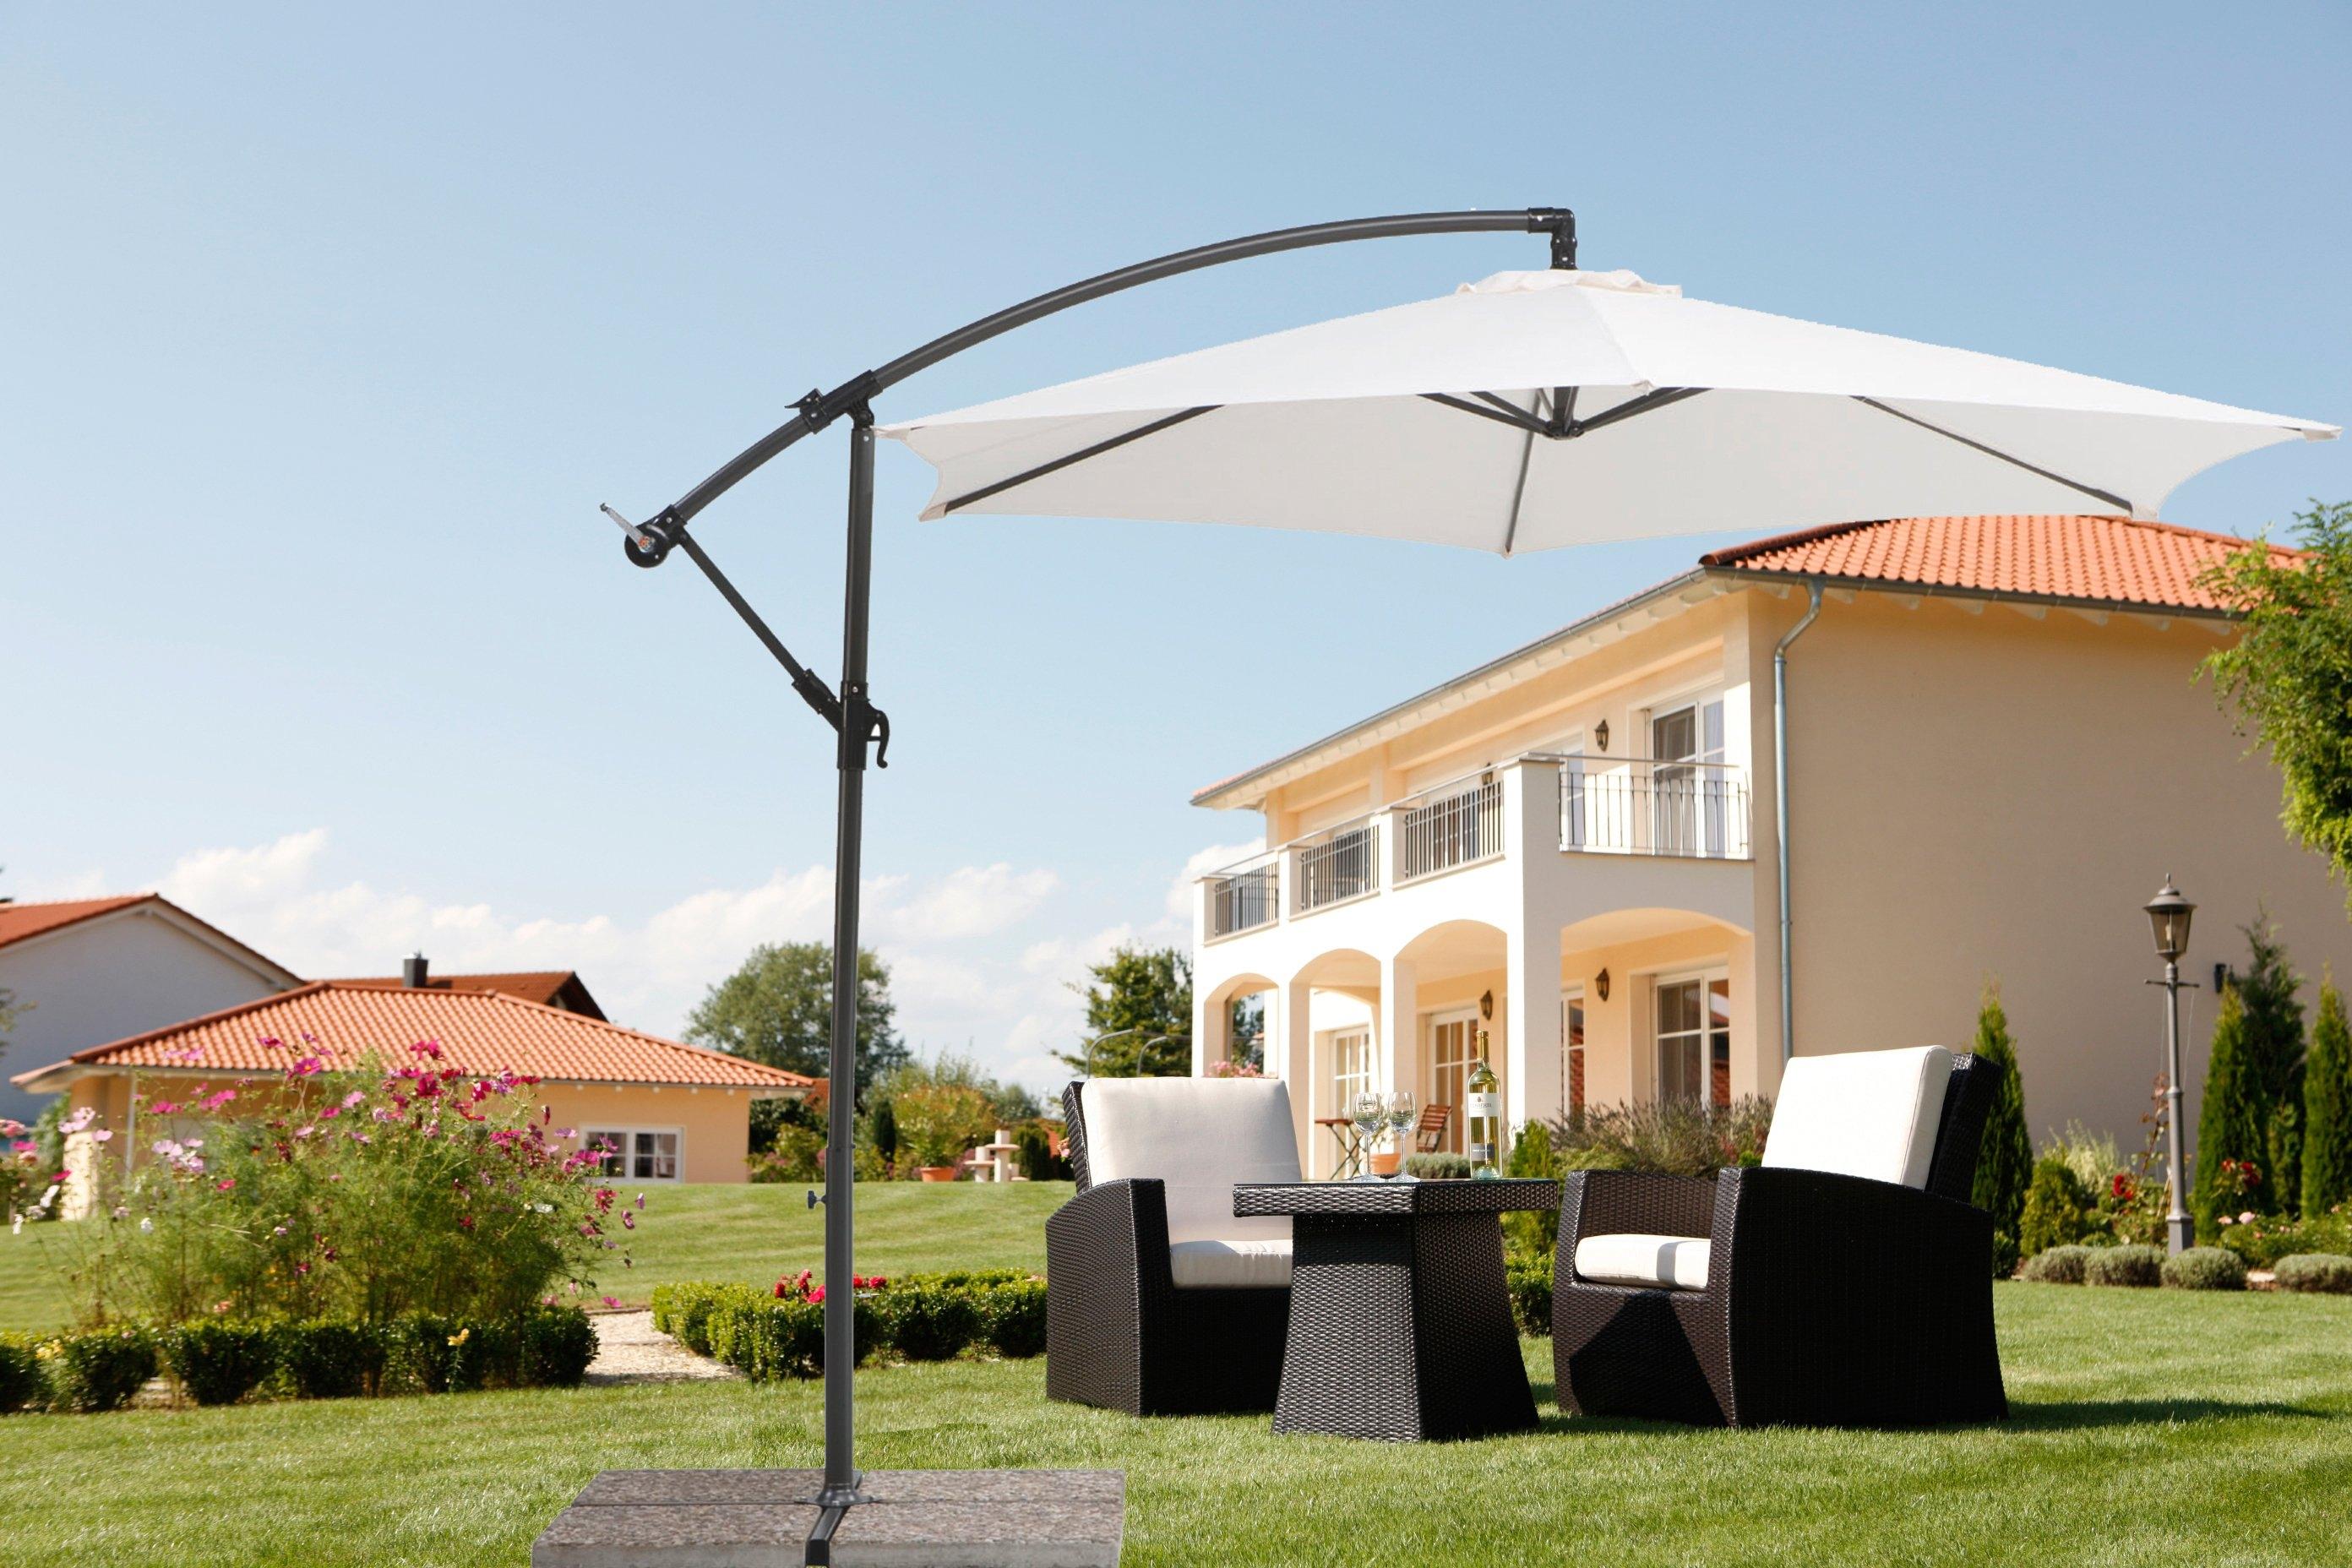 schneider parasols parasol venus online shop otto. Black Bedroom Furniture Sets. Home Design Ideas